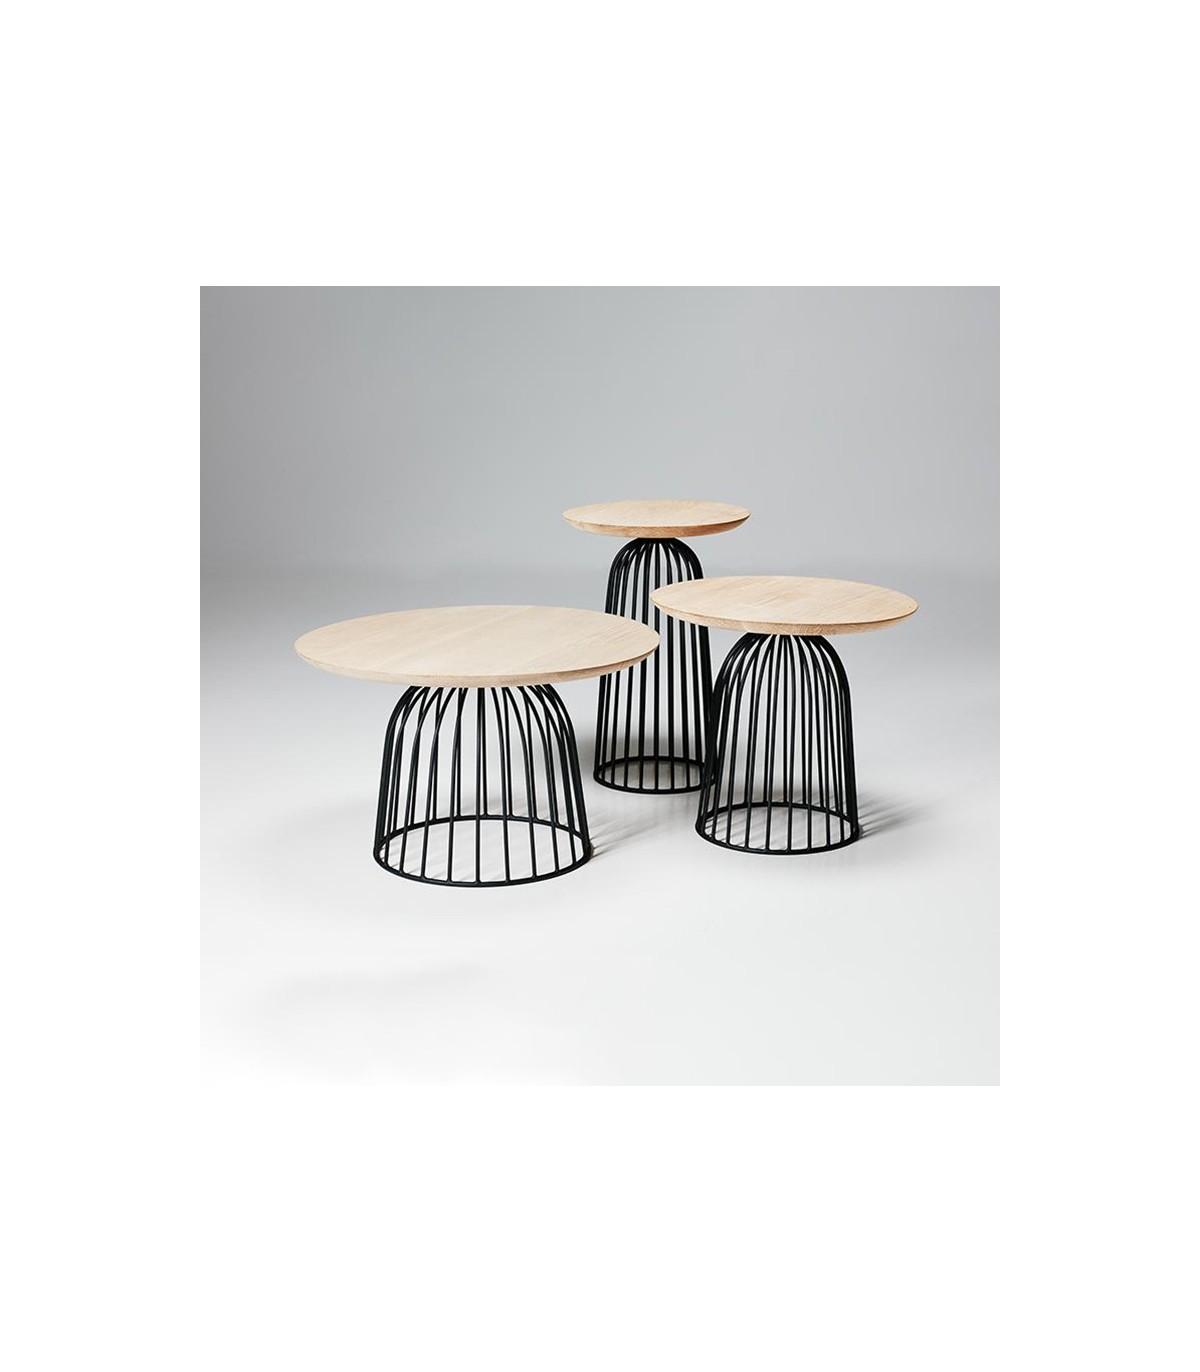 WIRE BASKET COFFEE TABLE WON DESIGN